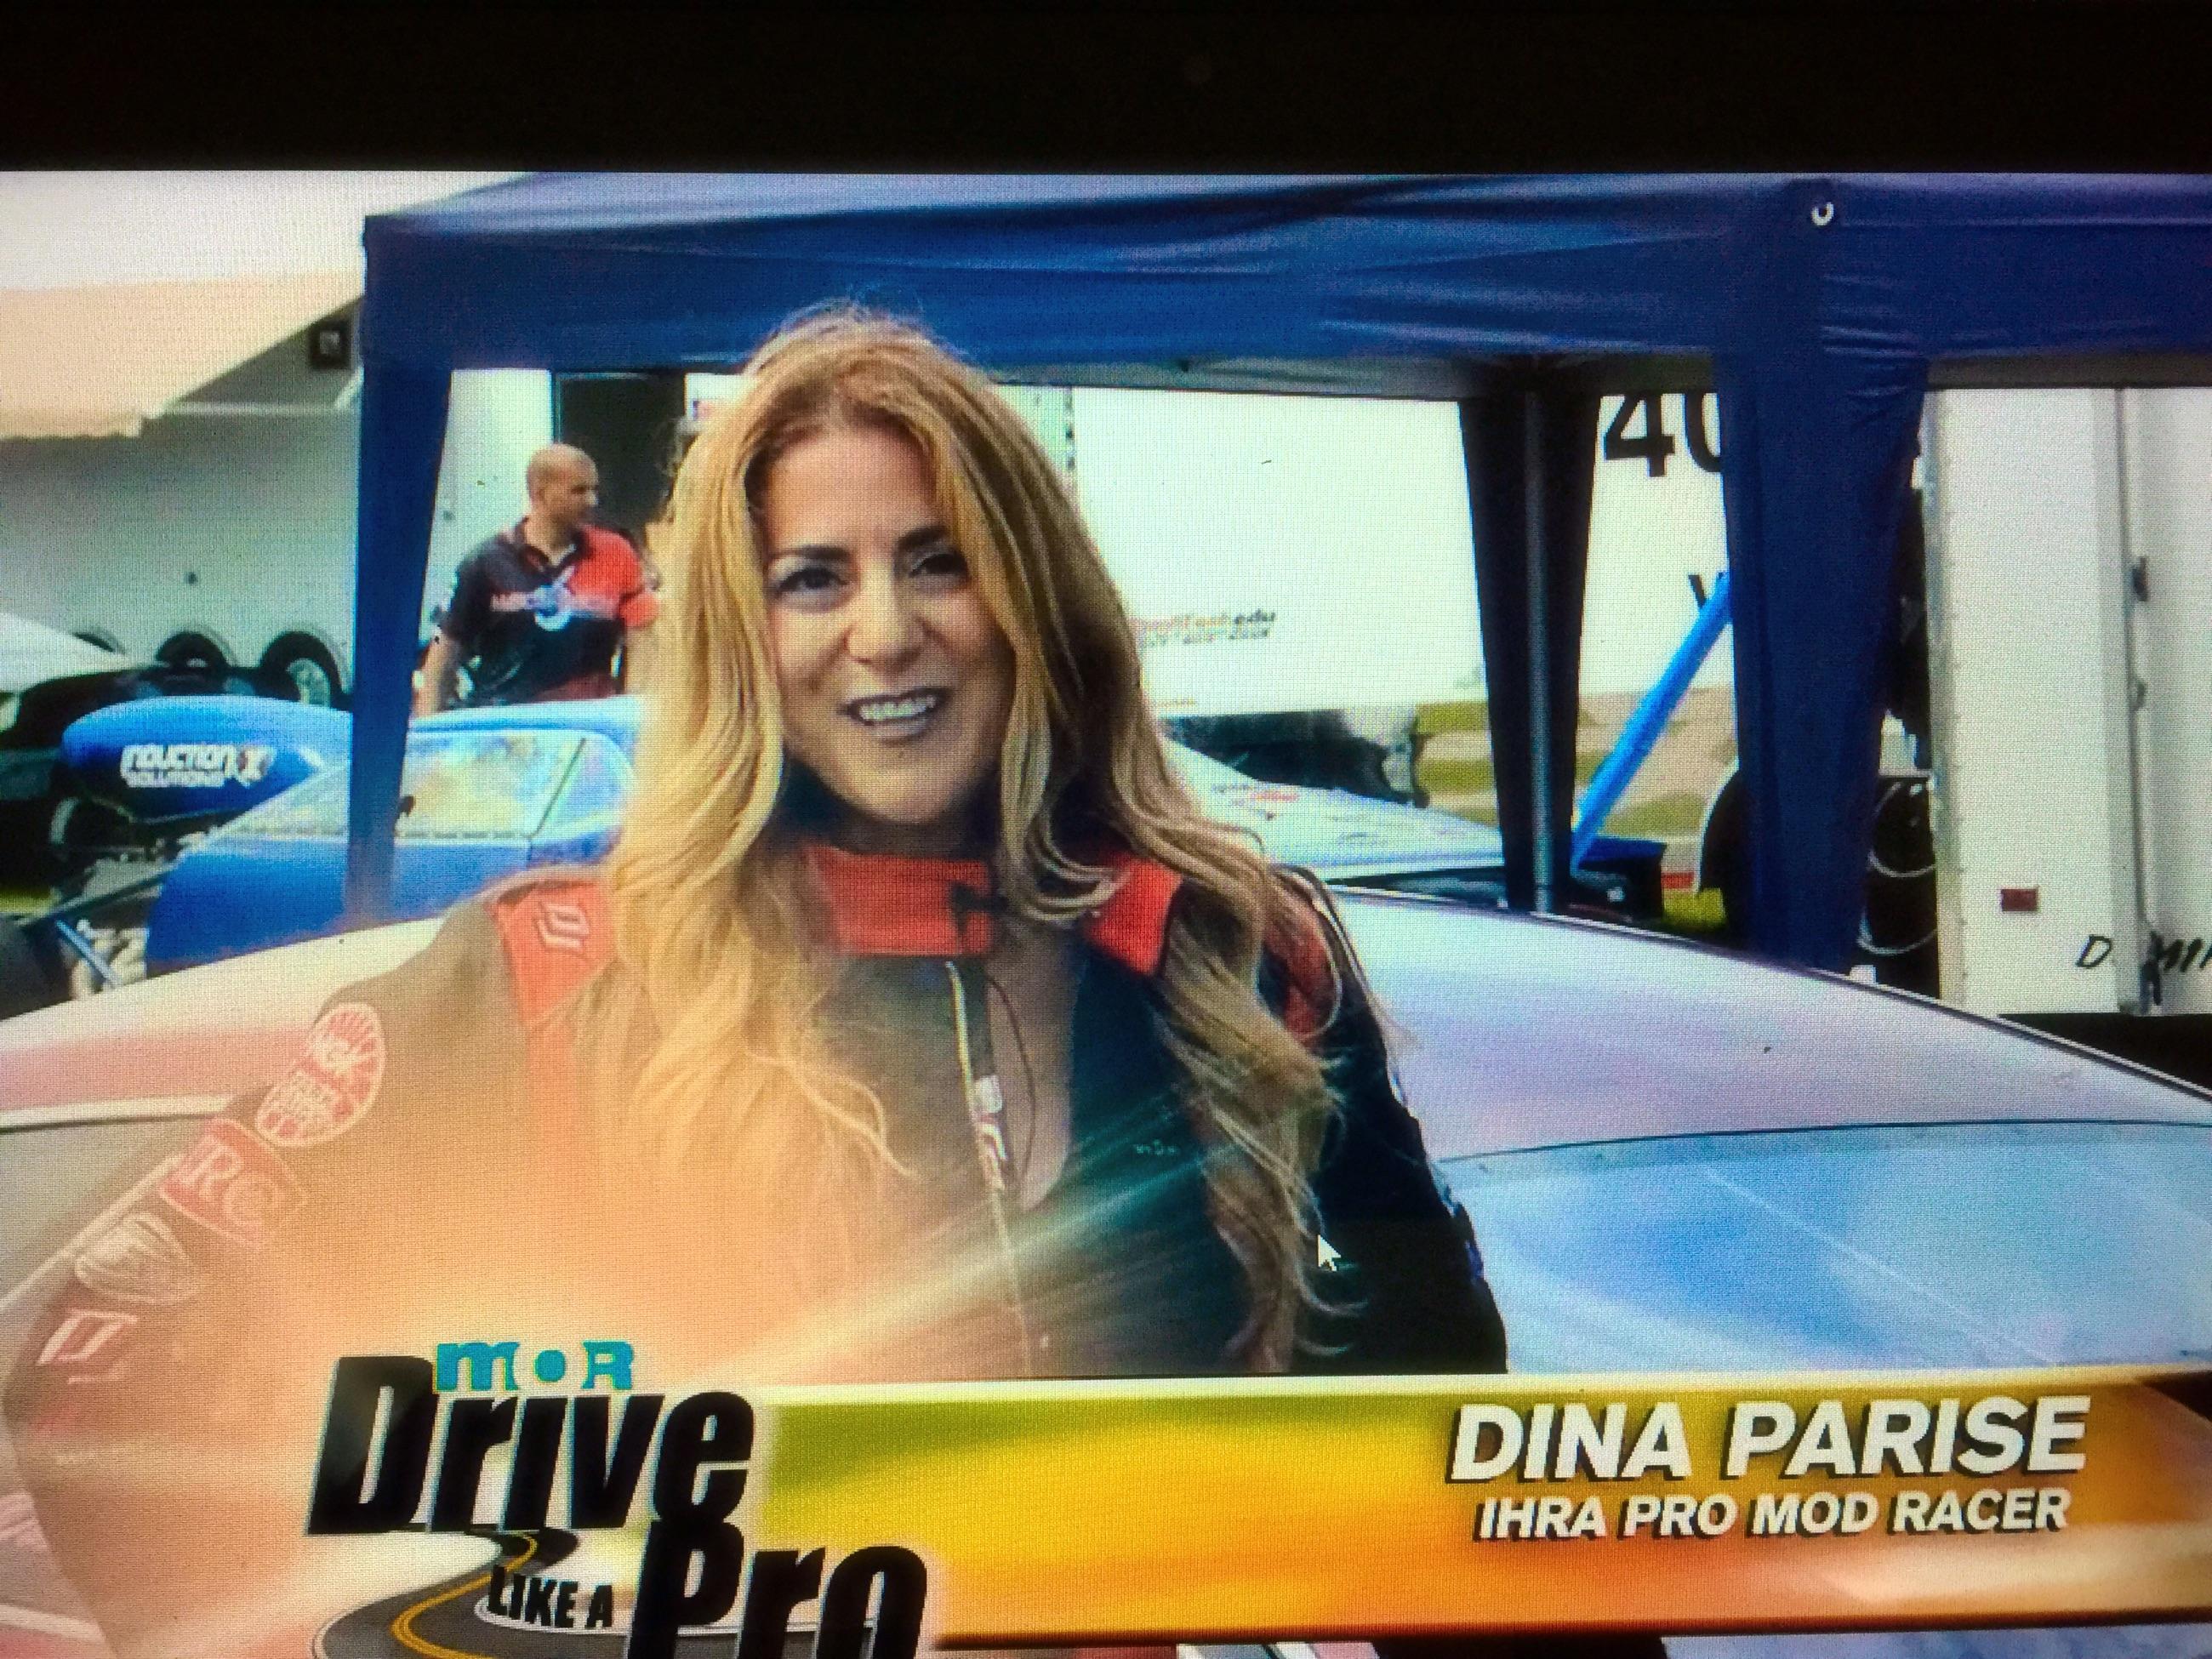 Dina Parise in MOR-TV Drive Like a Pro PSA